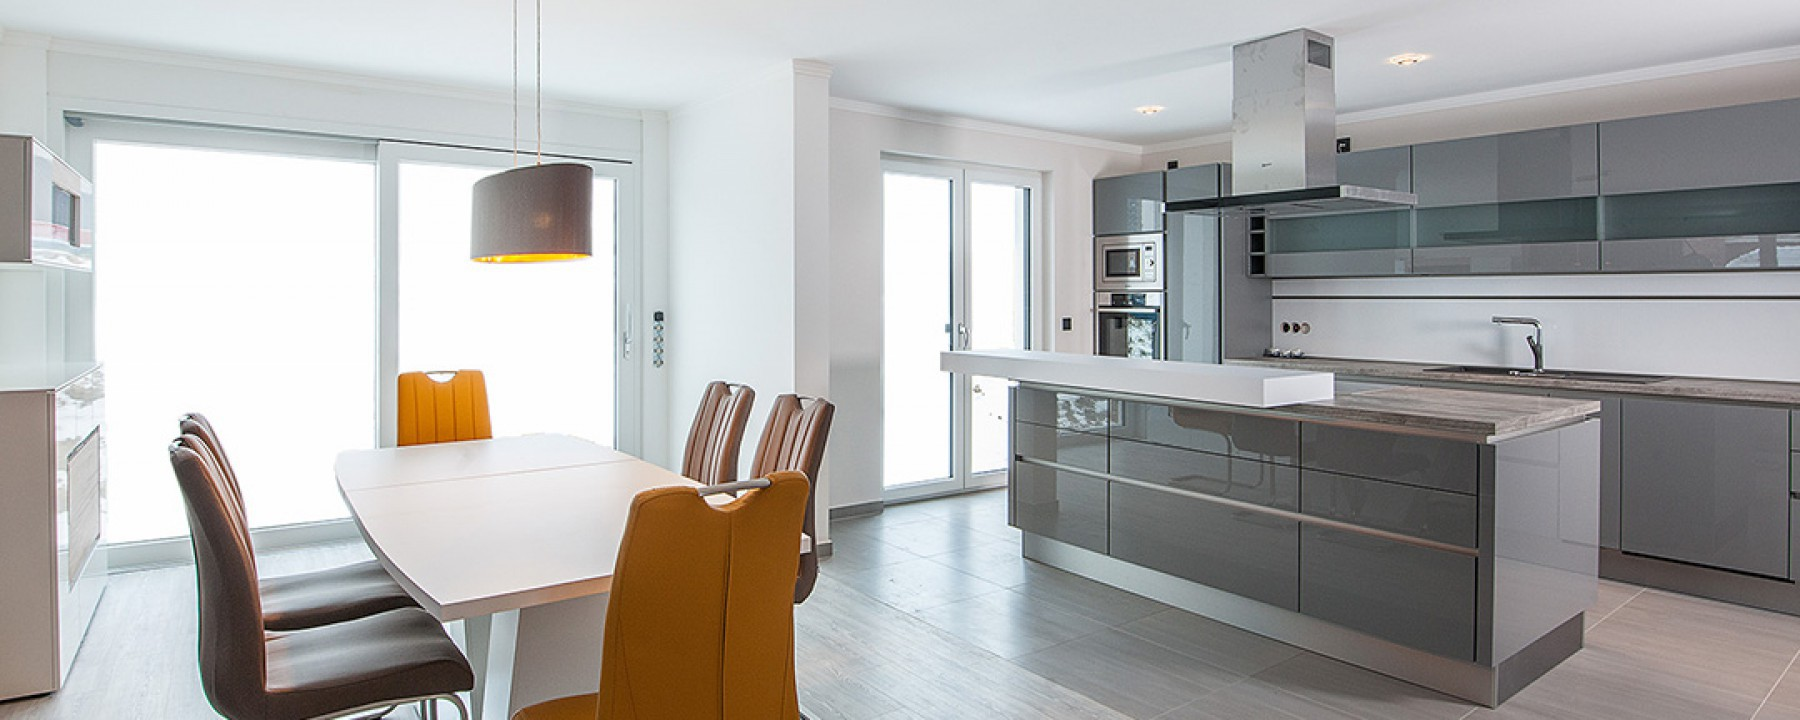 Innenraumgestaltung – Küche – Wohnraumgestaltung – FARBCOMPANY